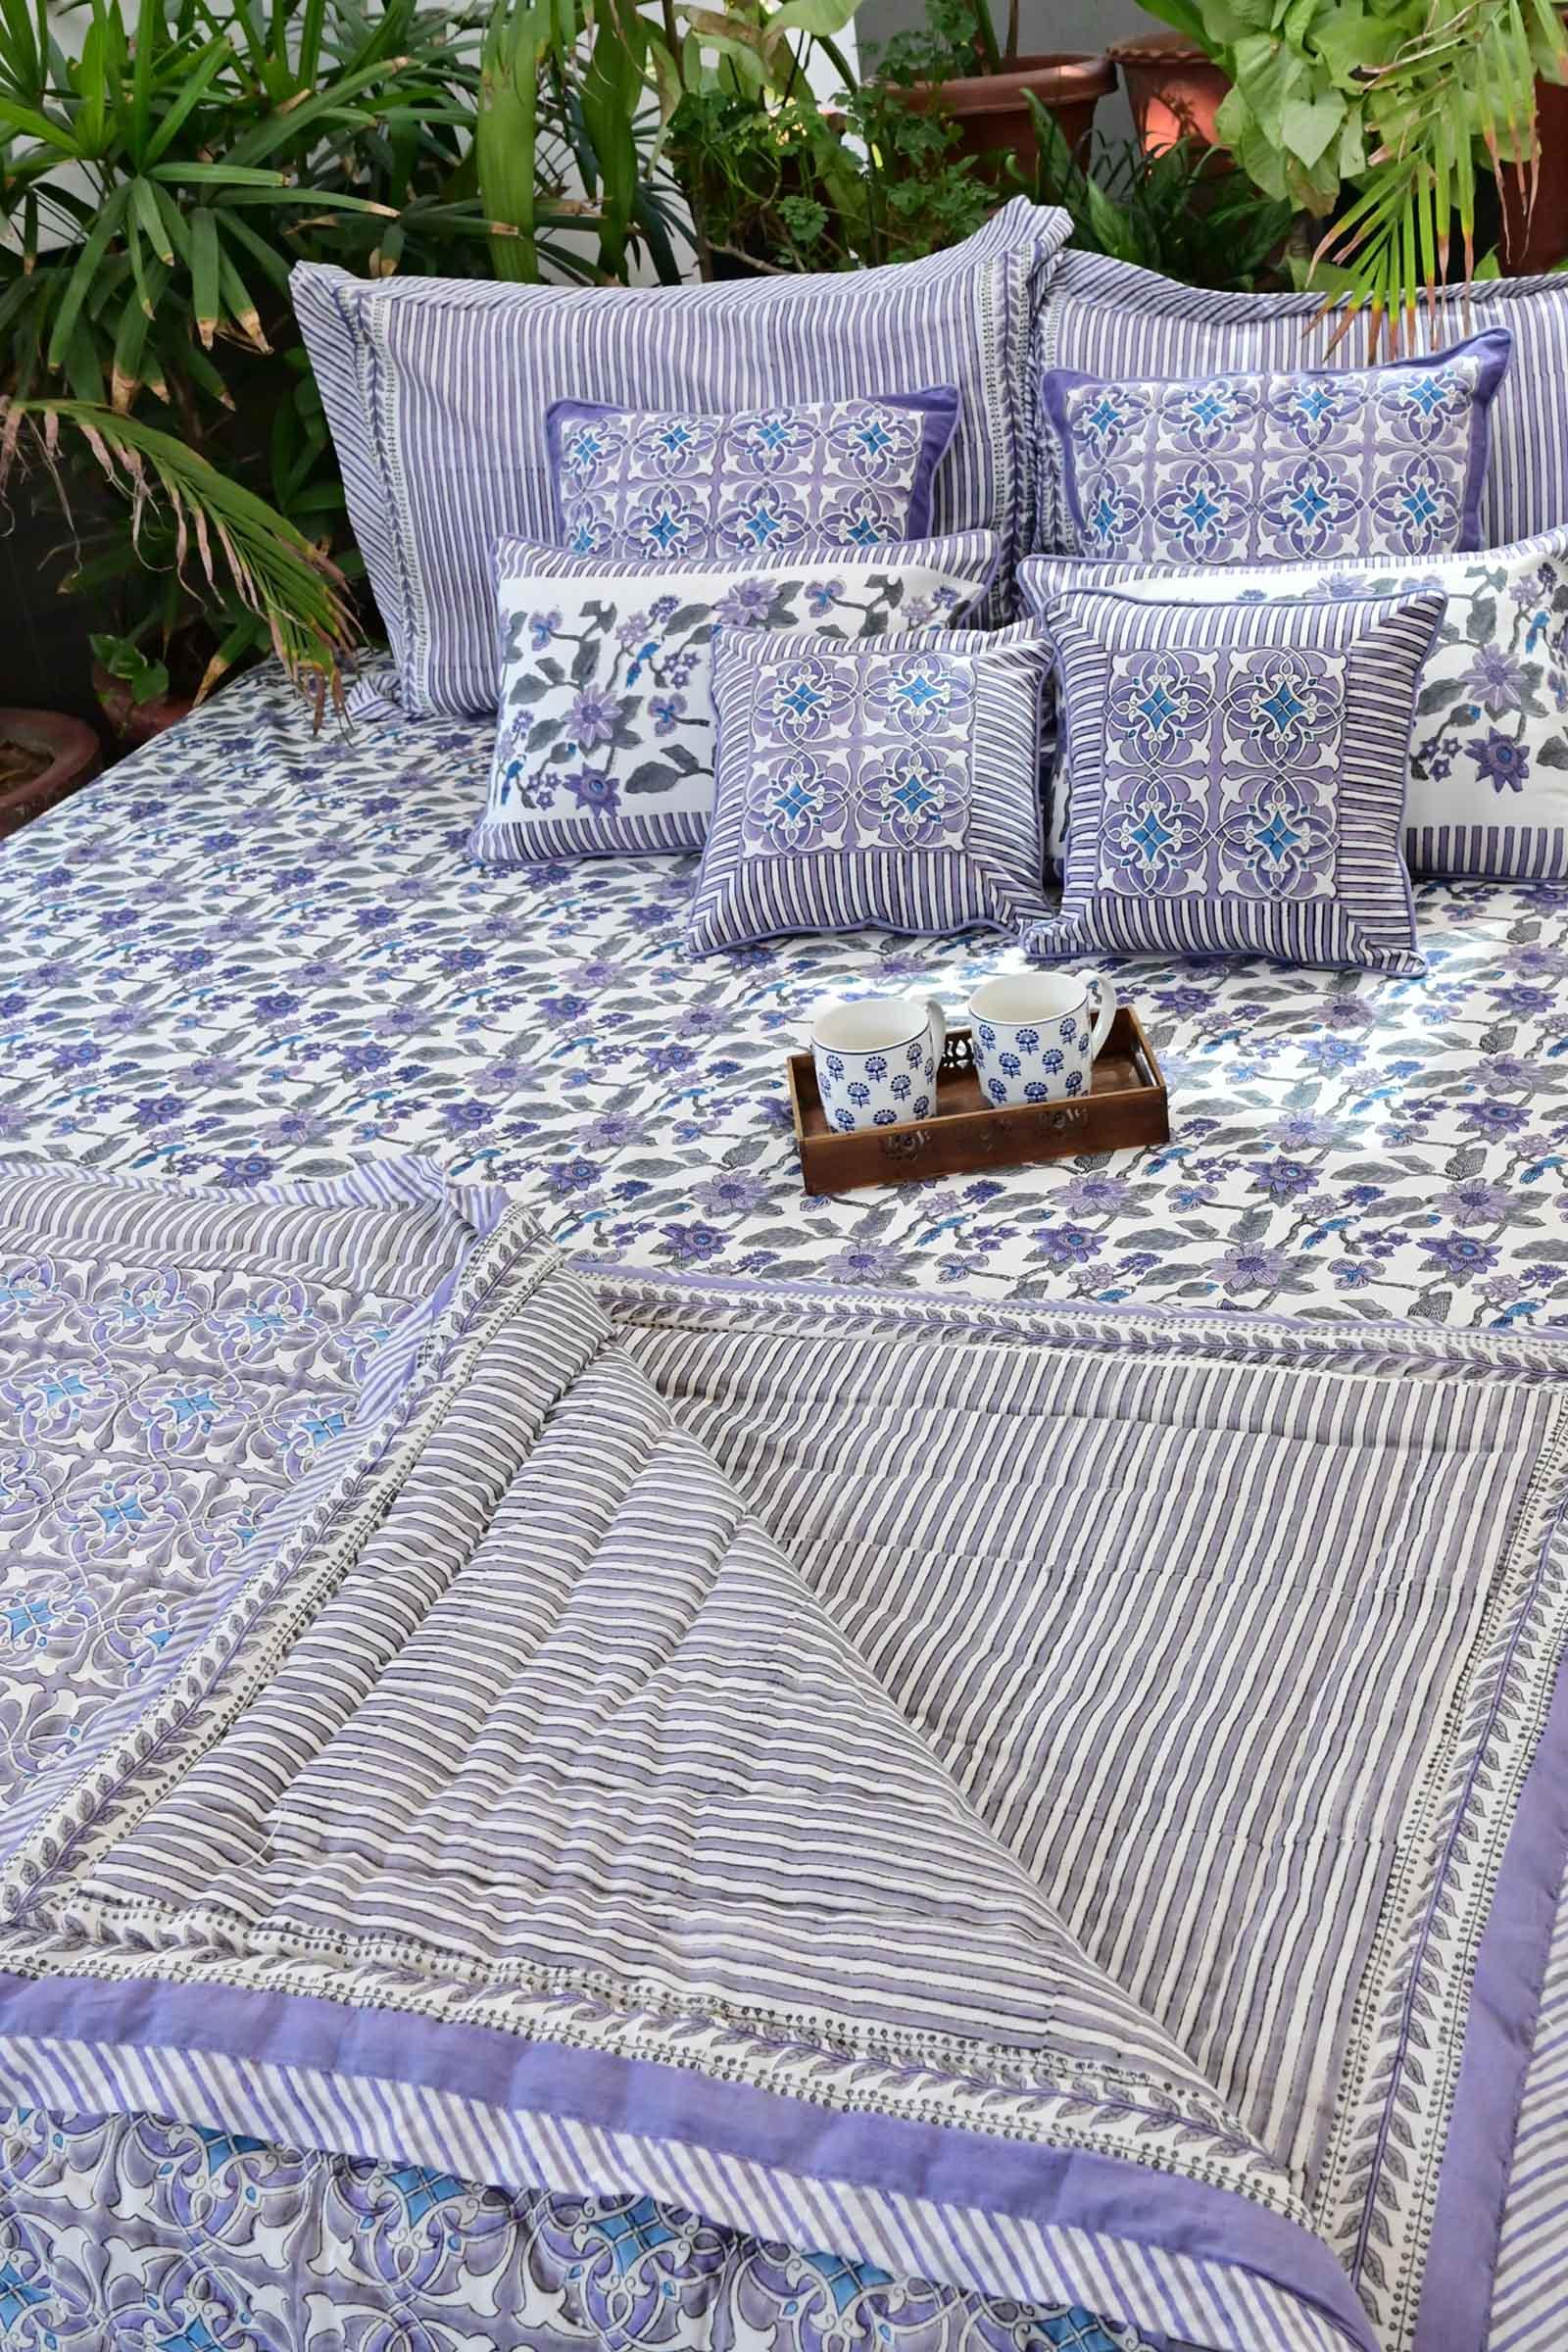 Artistic Lavender Quilts